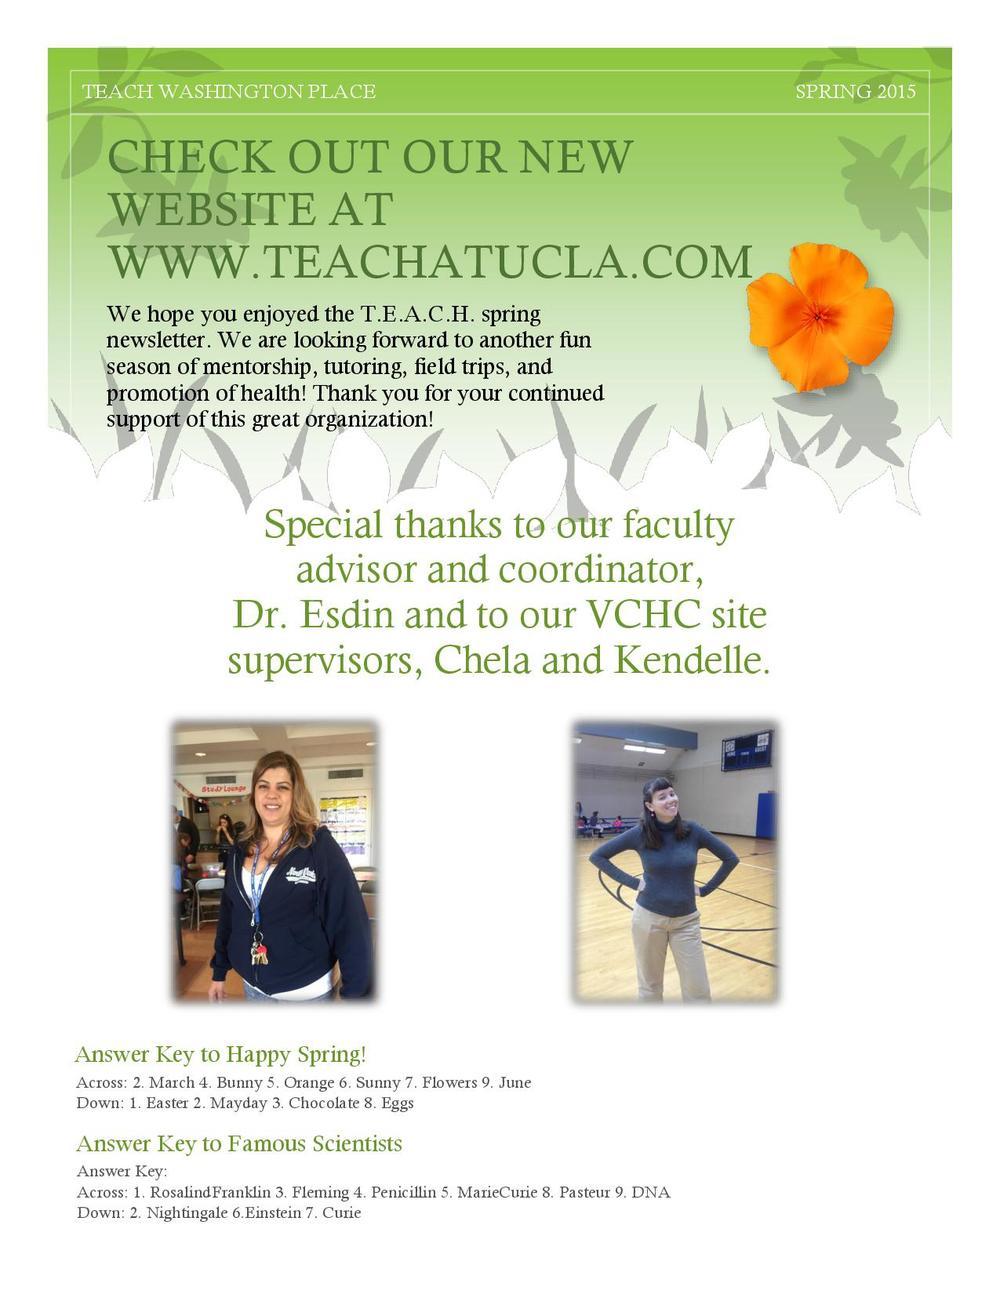 UPLOAD - Washington Newsletter Spring 2015-page-010.jpg